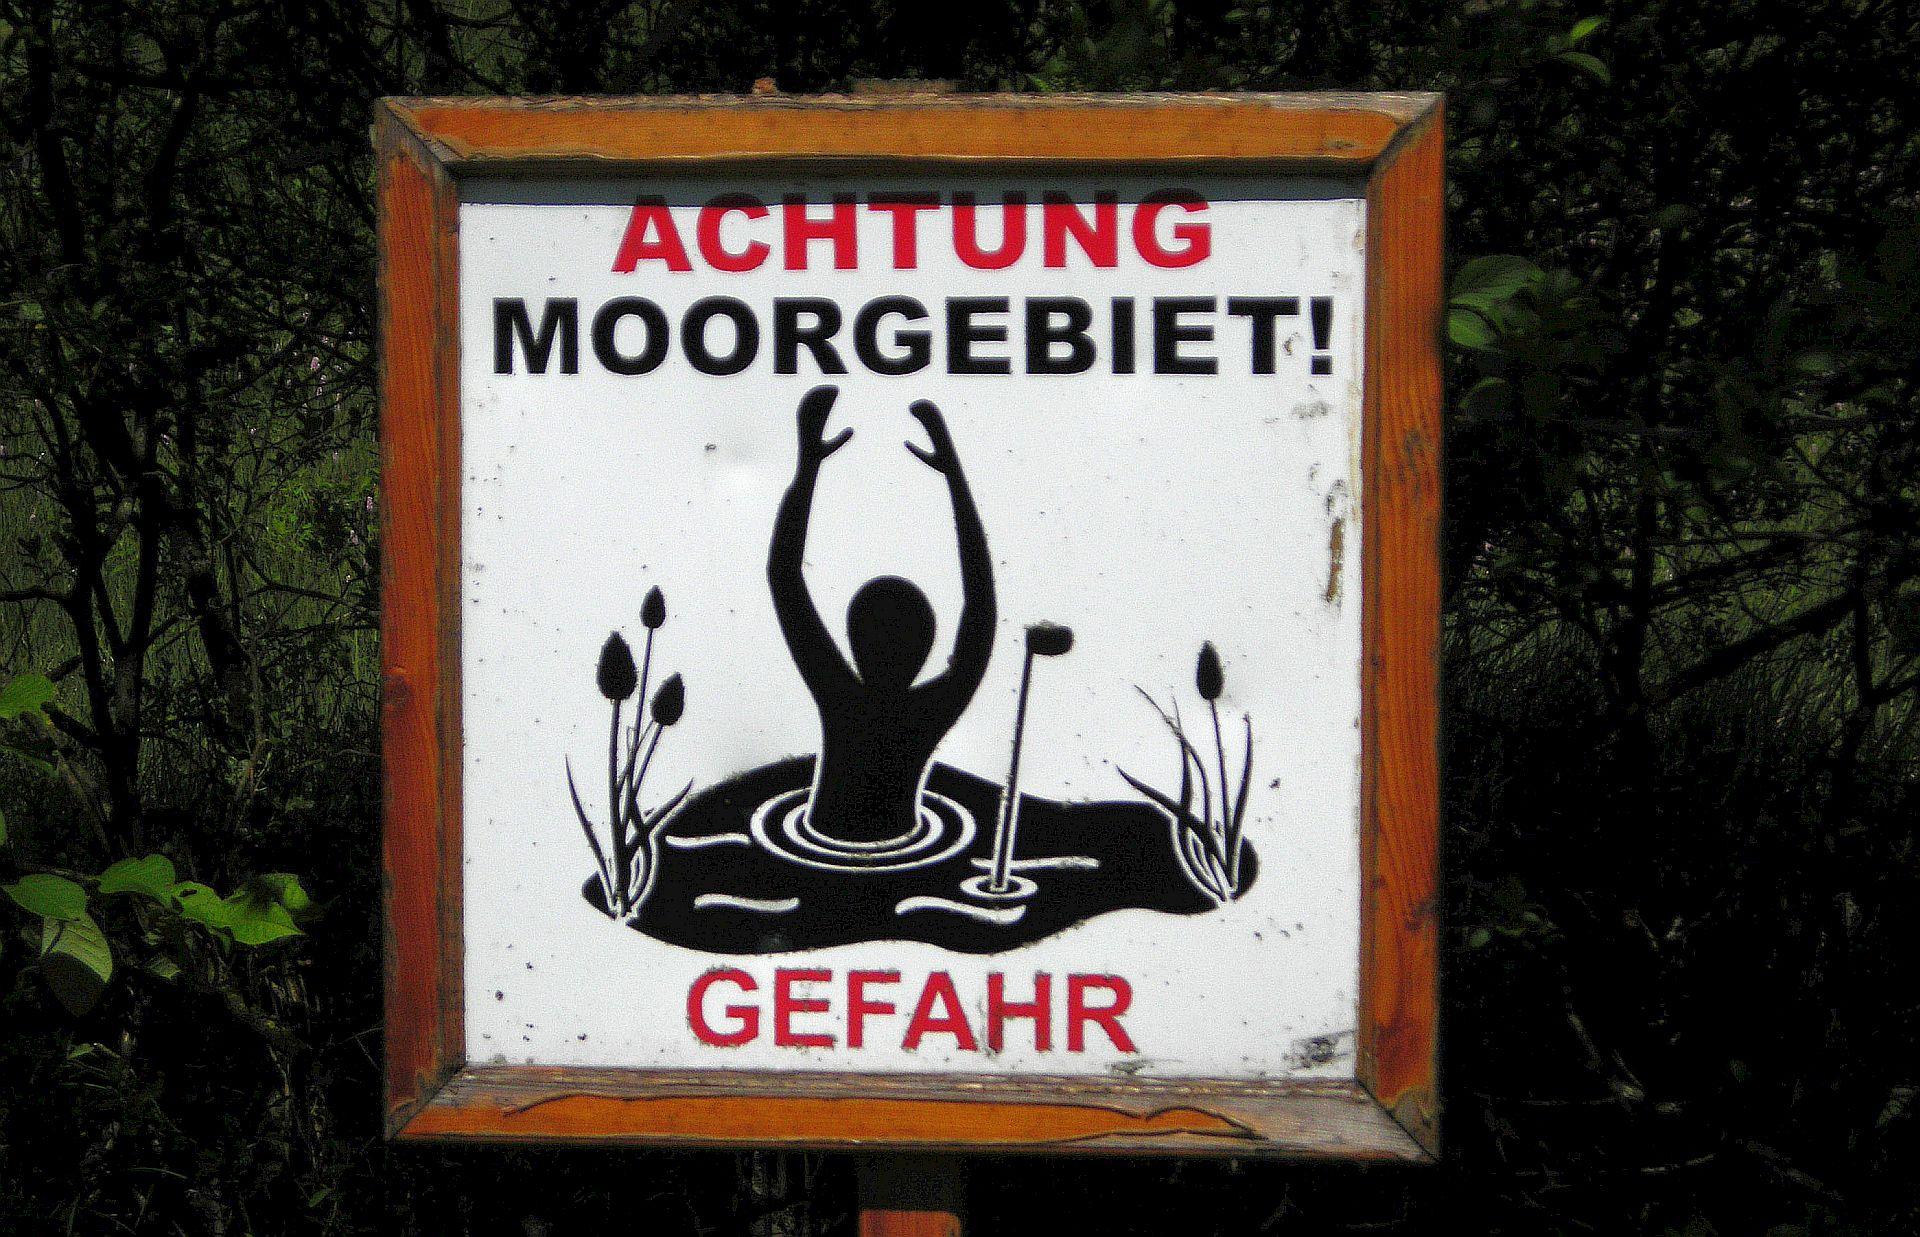 Bloß nicht abtauchen! Gesehen im GC Berchtesgadner Land (Foto: Stephan Schöttl/alpengolfer.de)